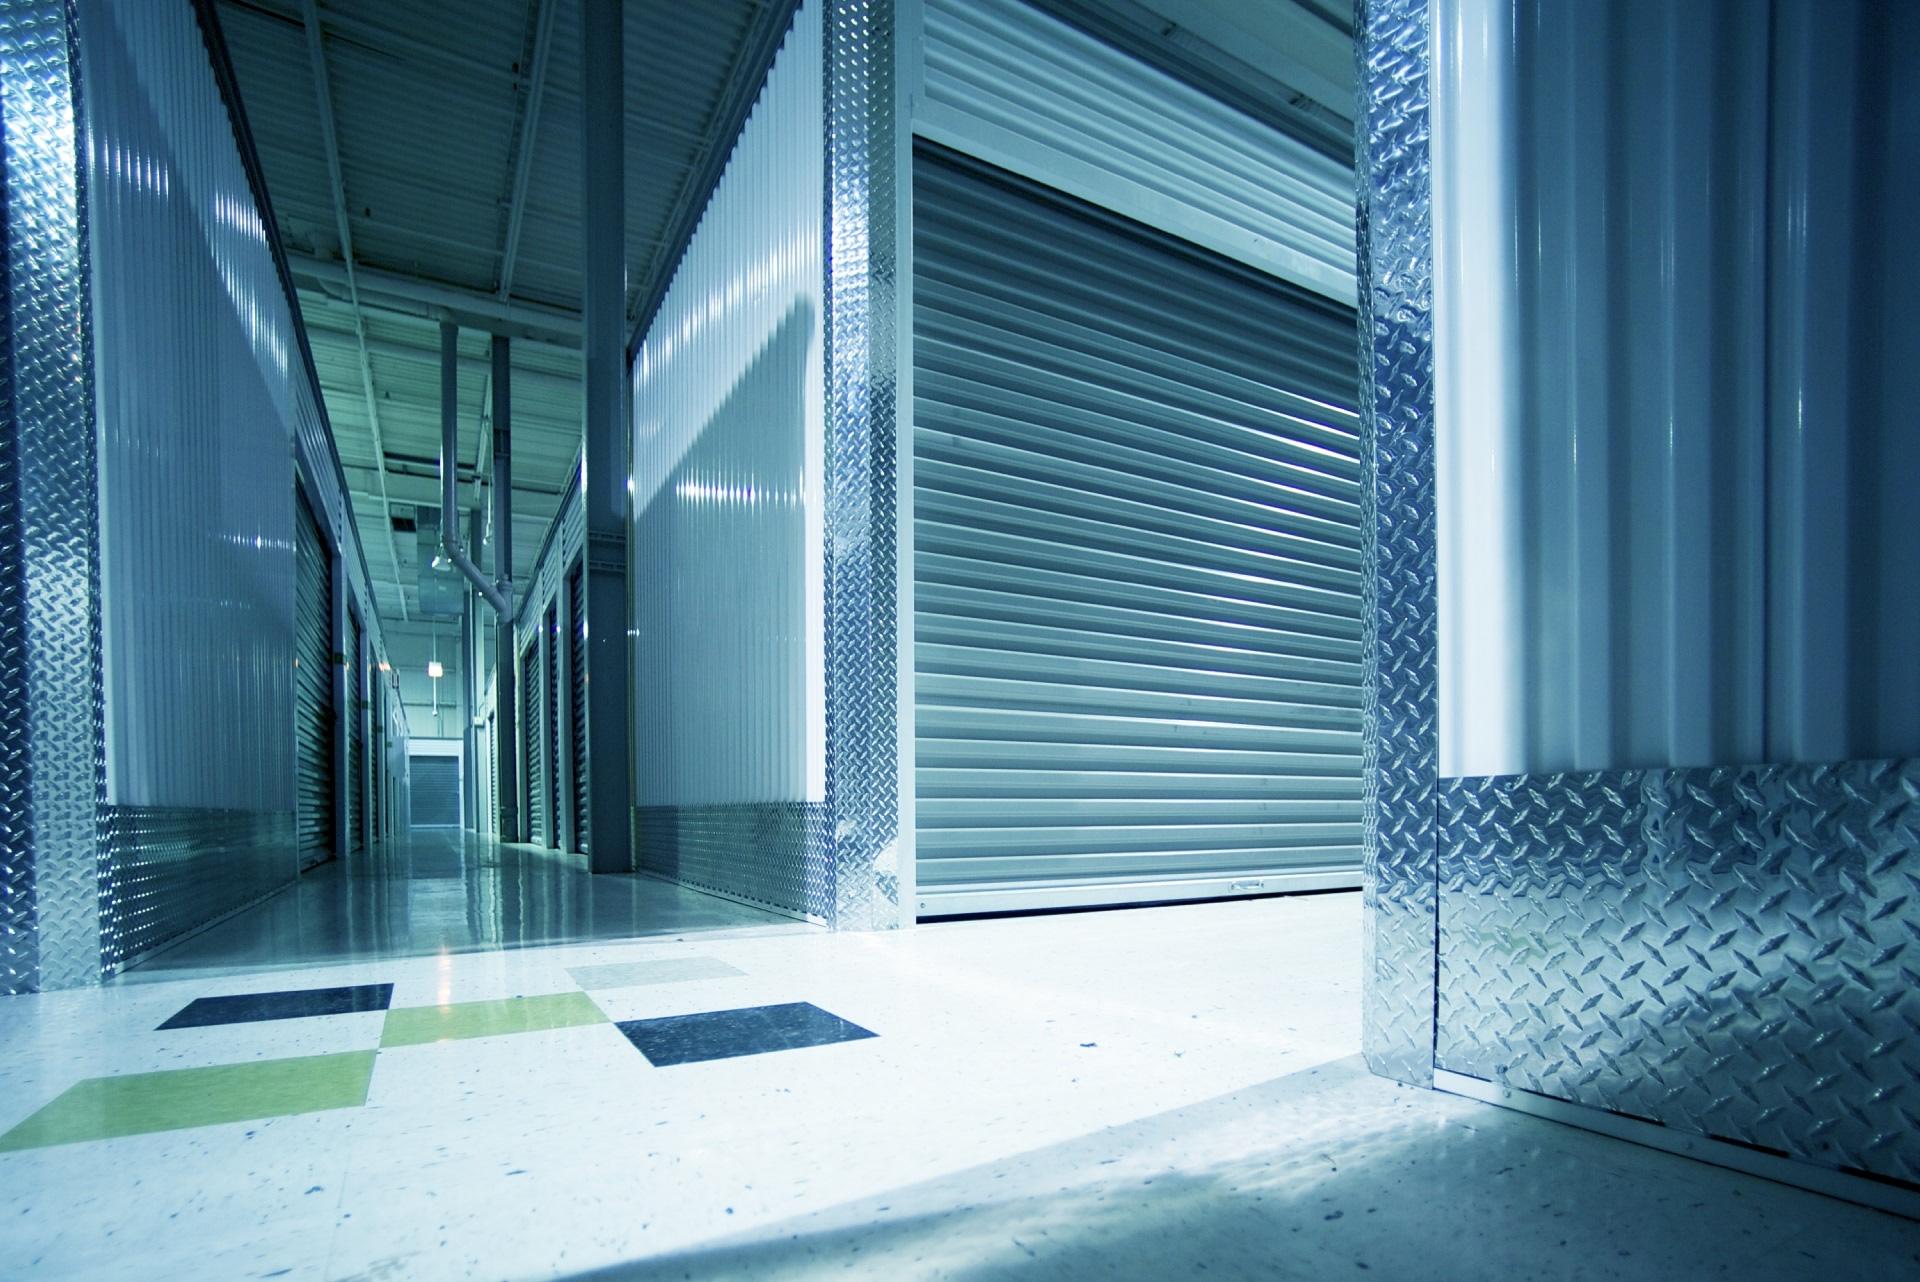 bigstock-Storage-Units-Hallway-1920-12801